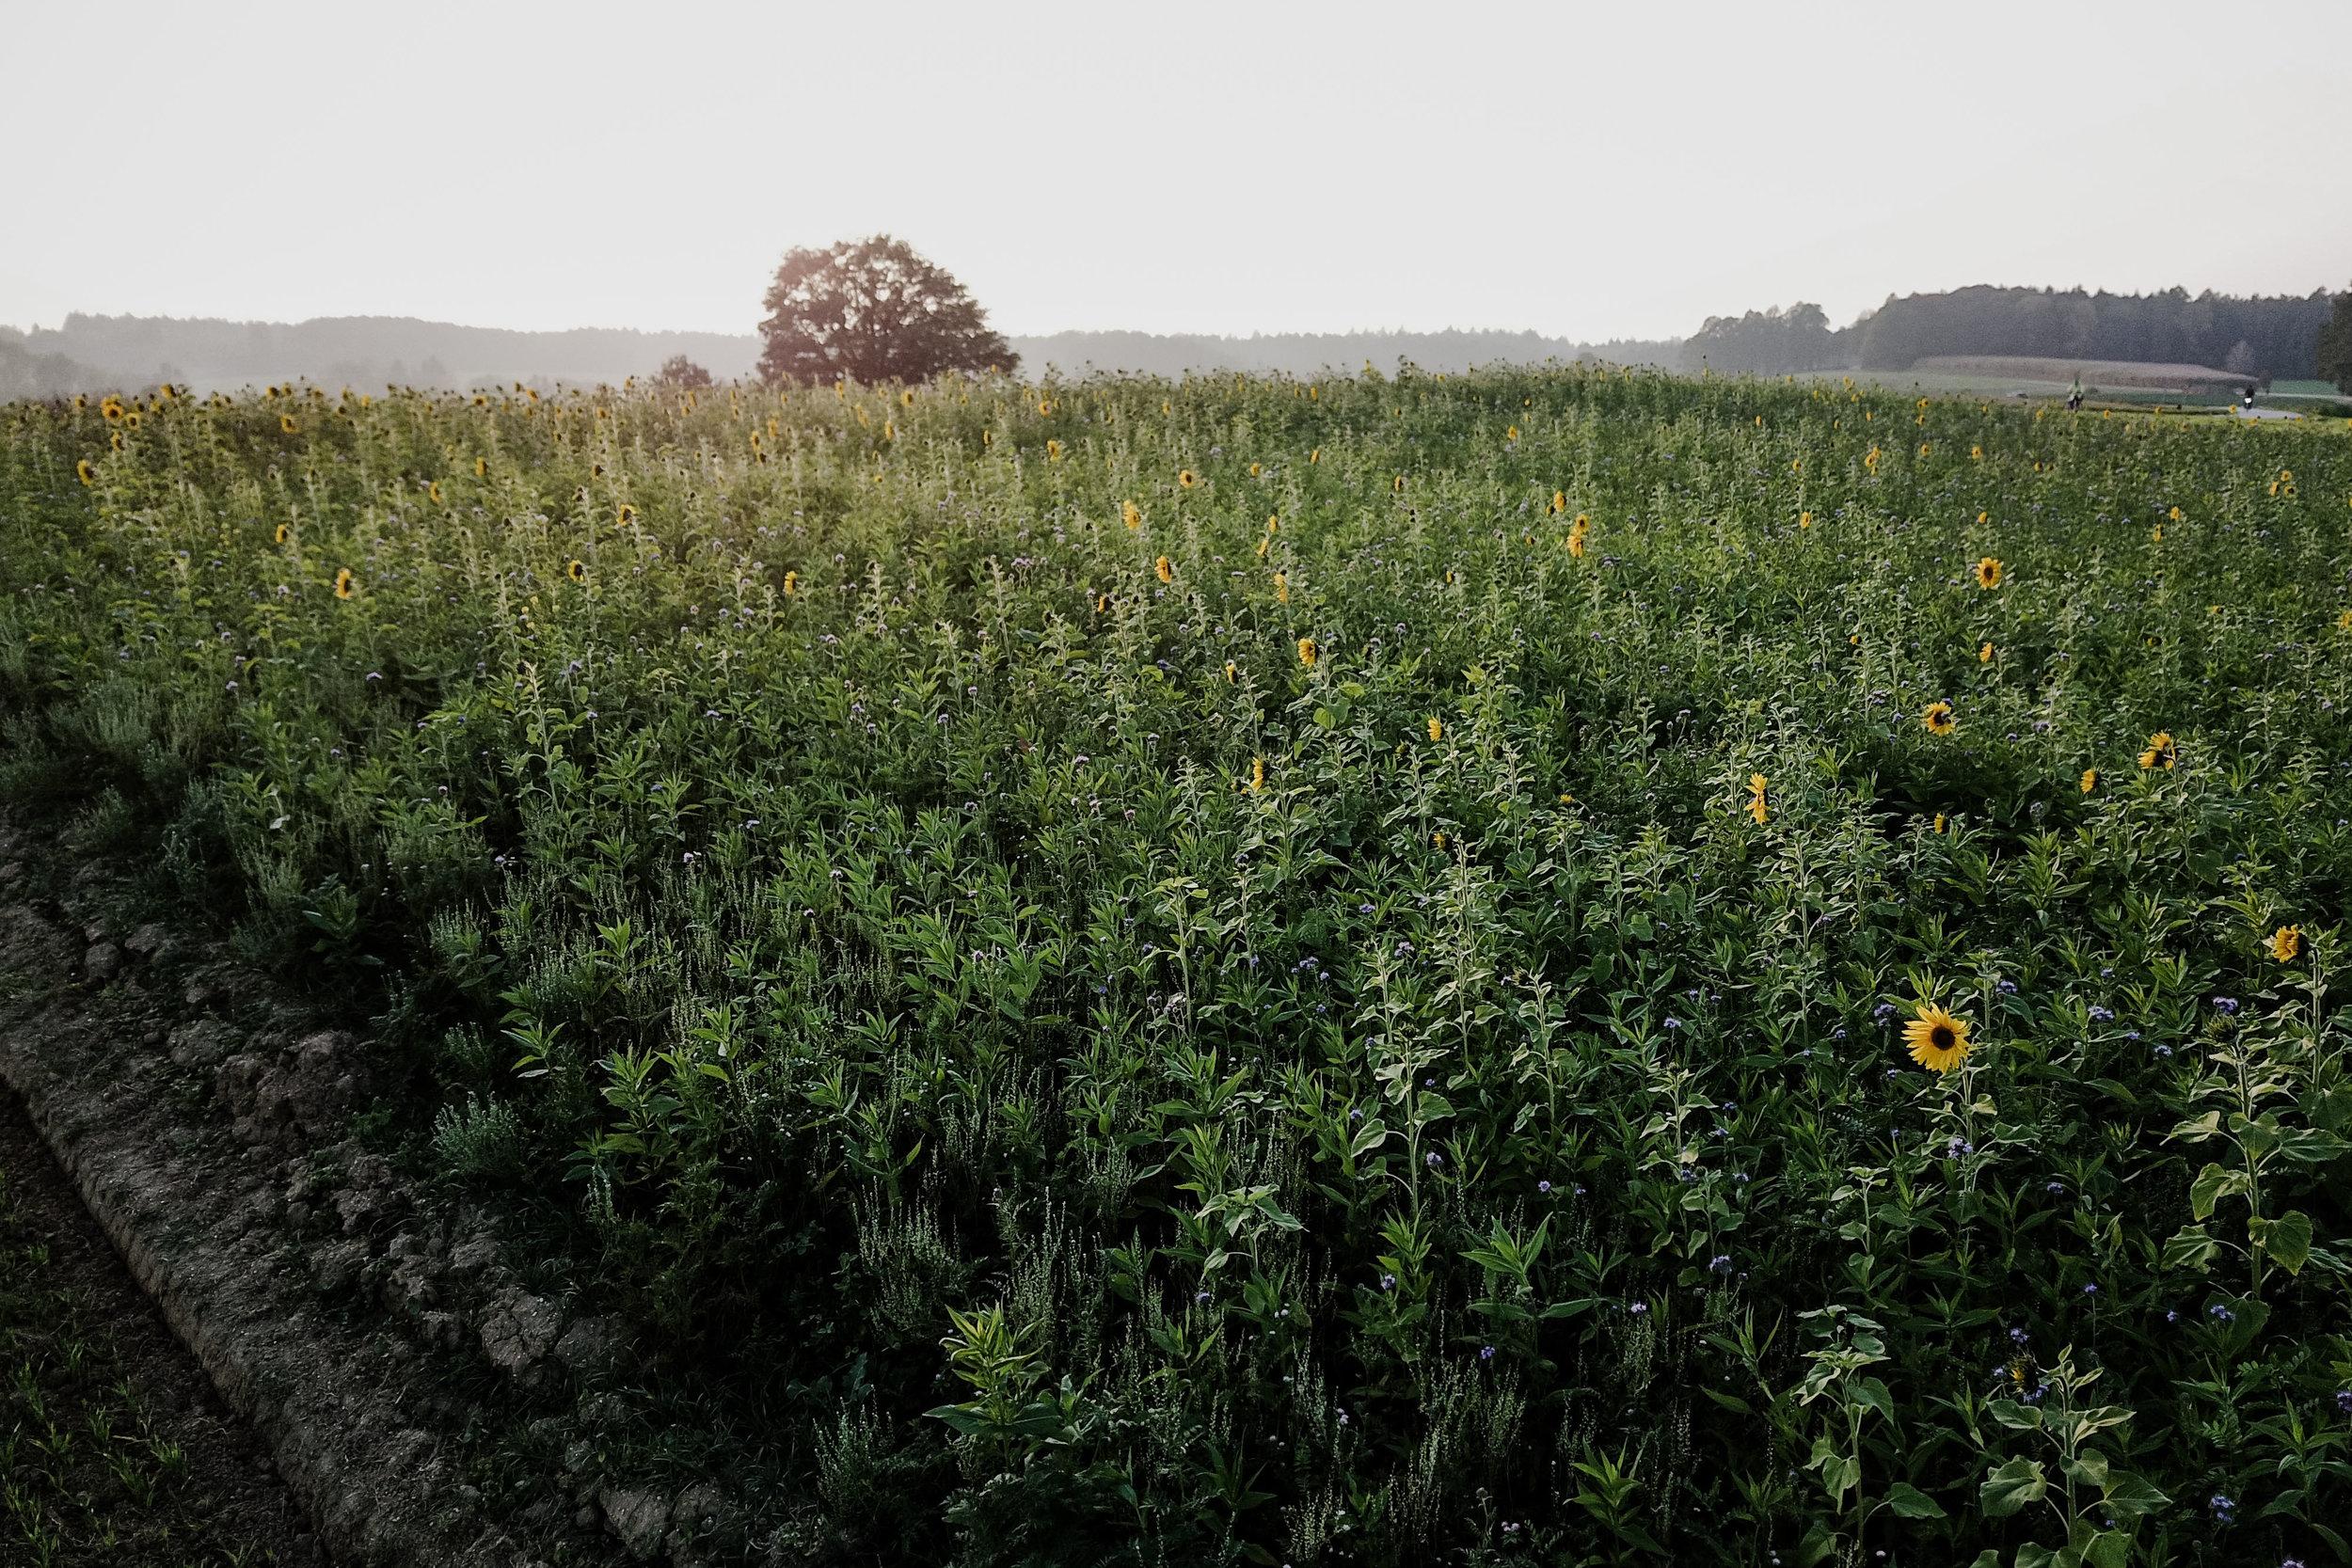 Sonnenblumenfeld, Freising, Drohnenaufnahme